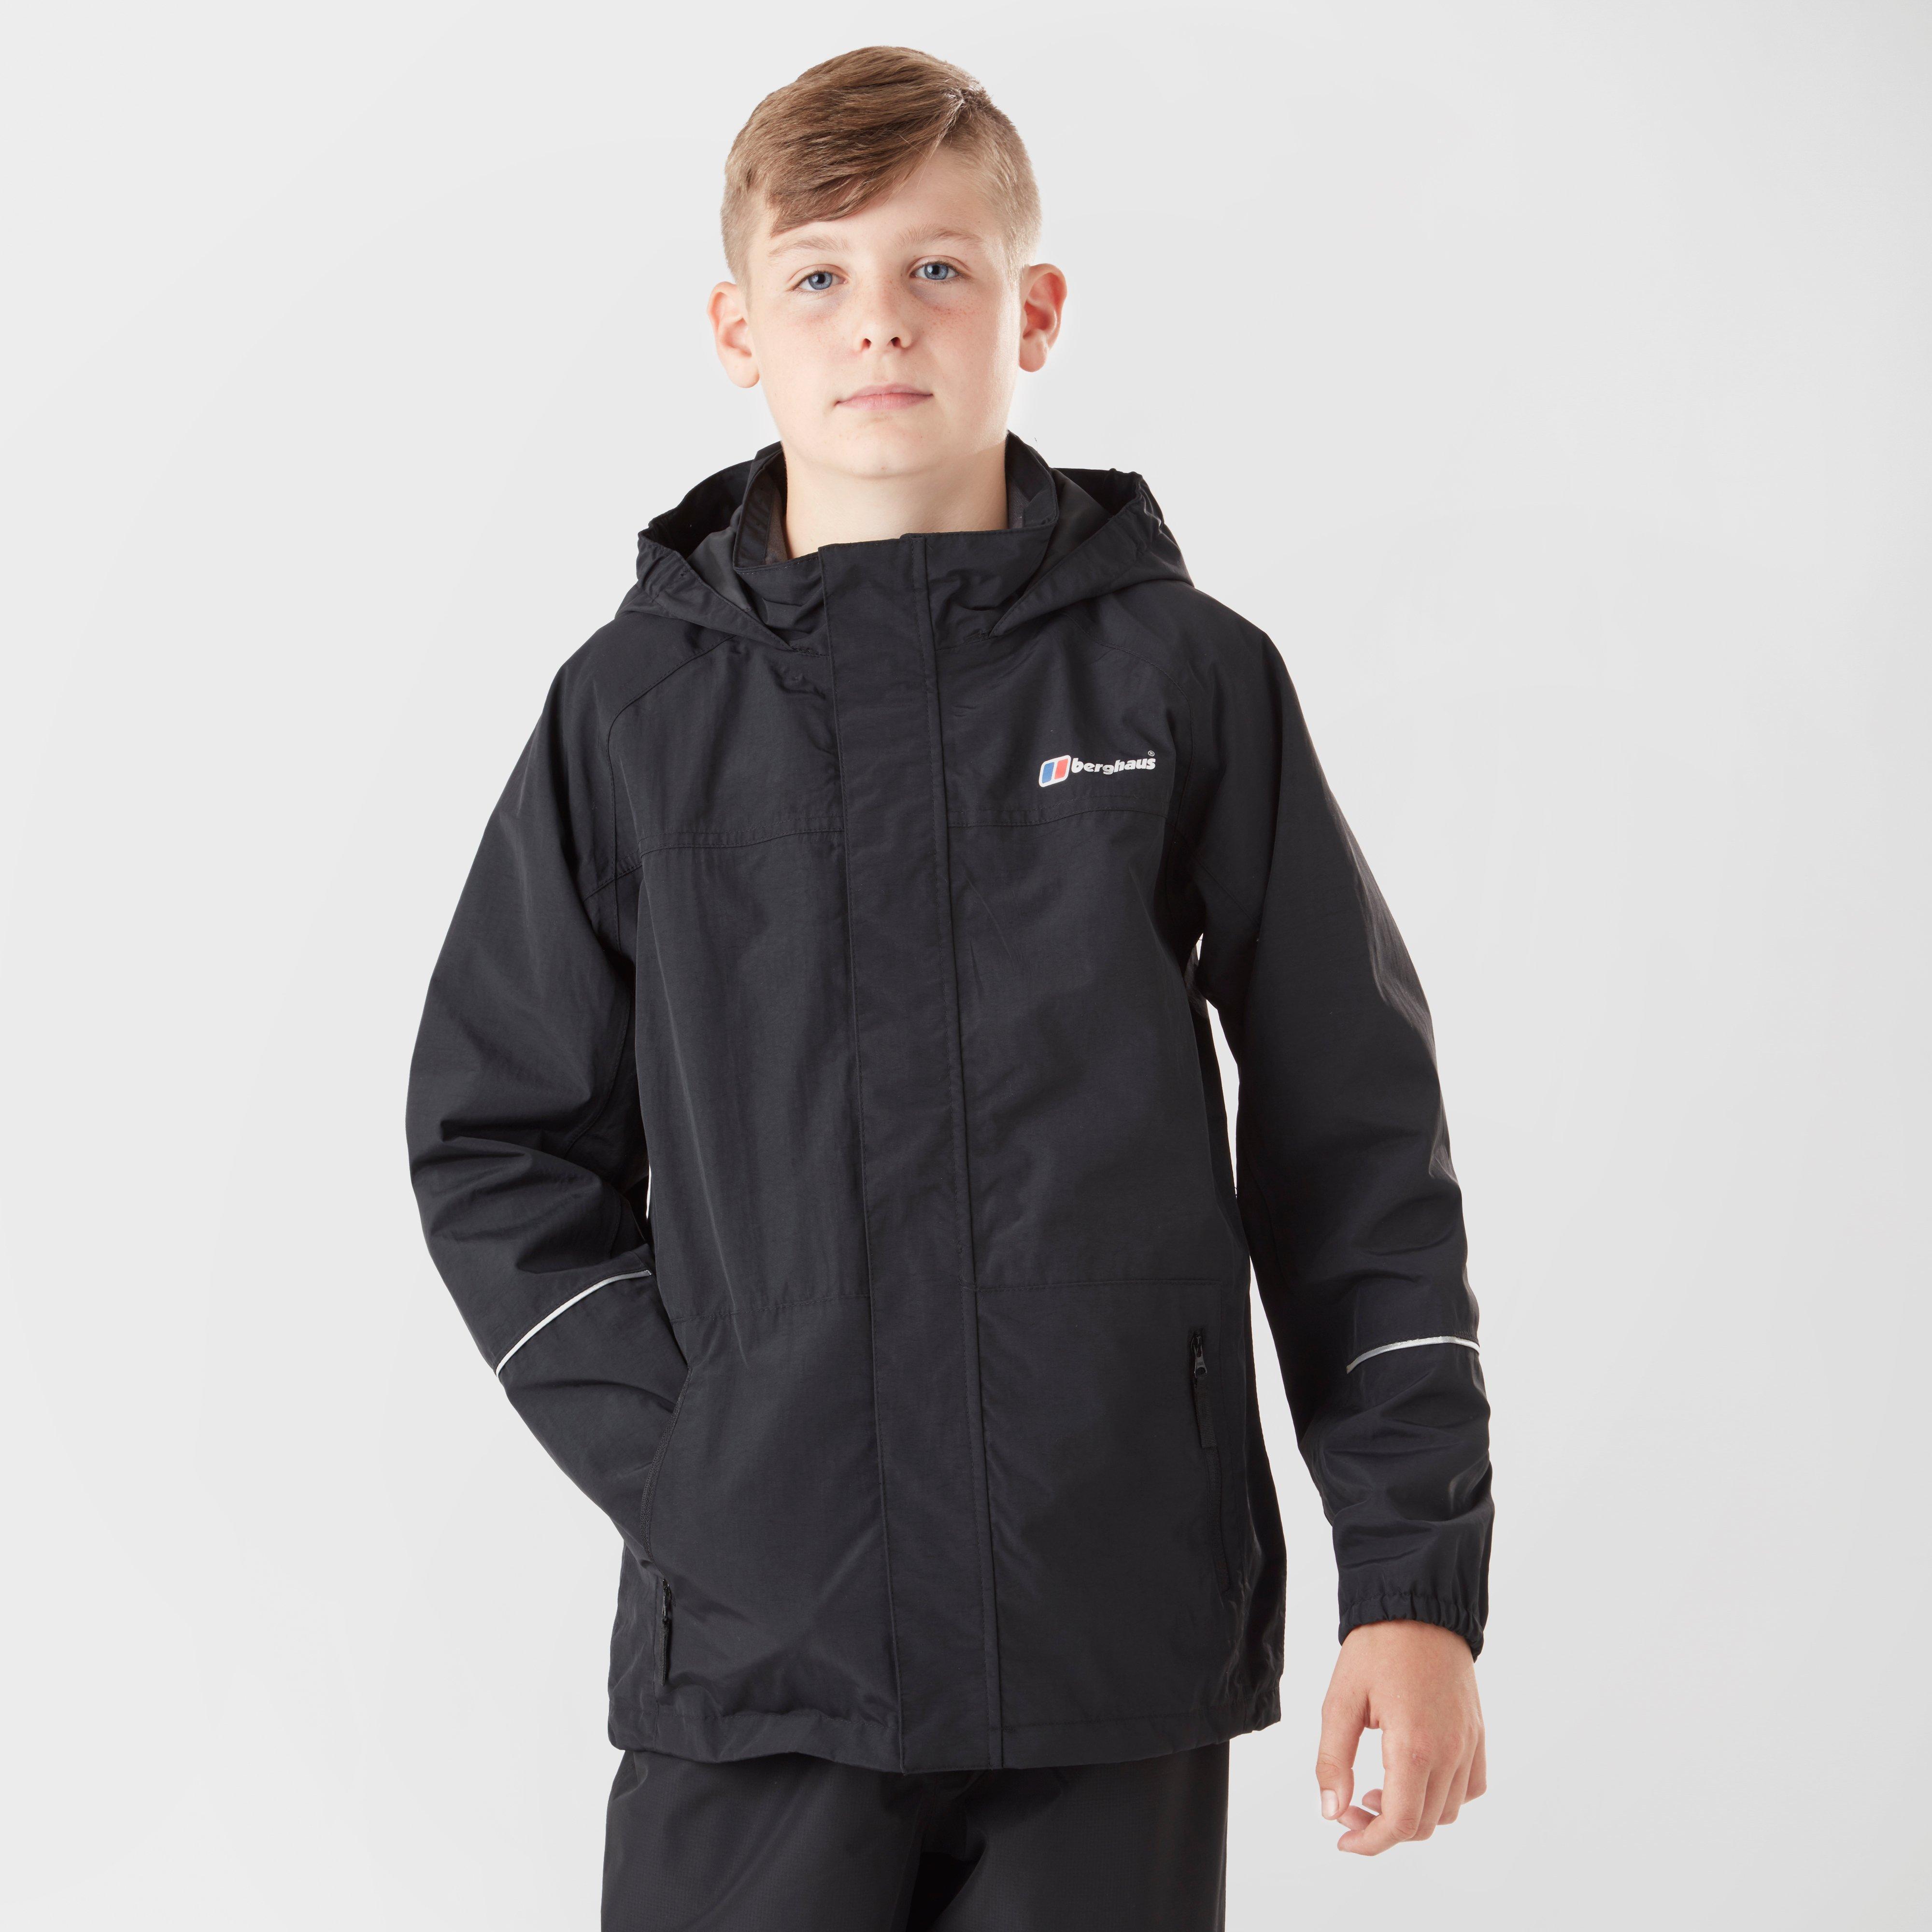 Berghaus Kids Callander Jacket - Black  Black